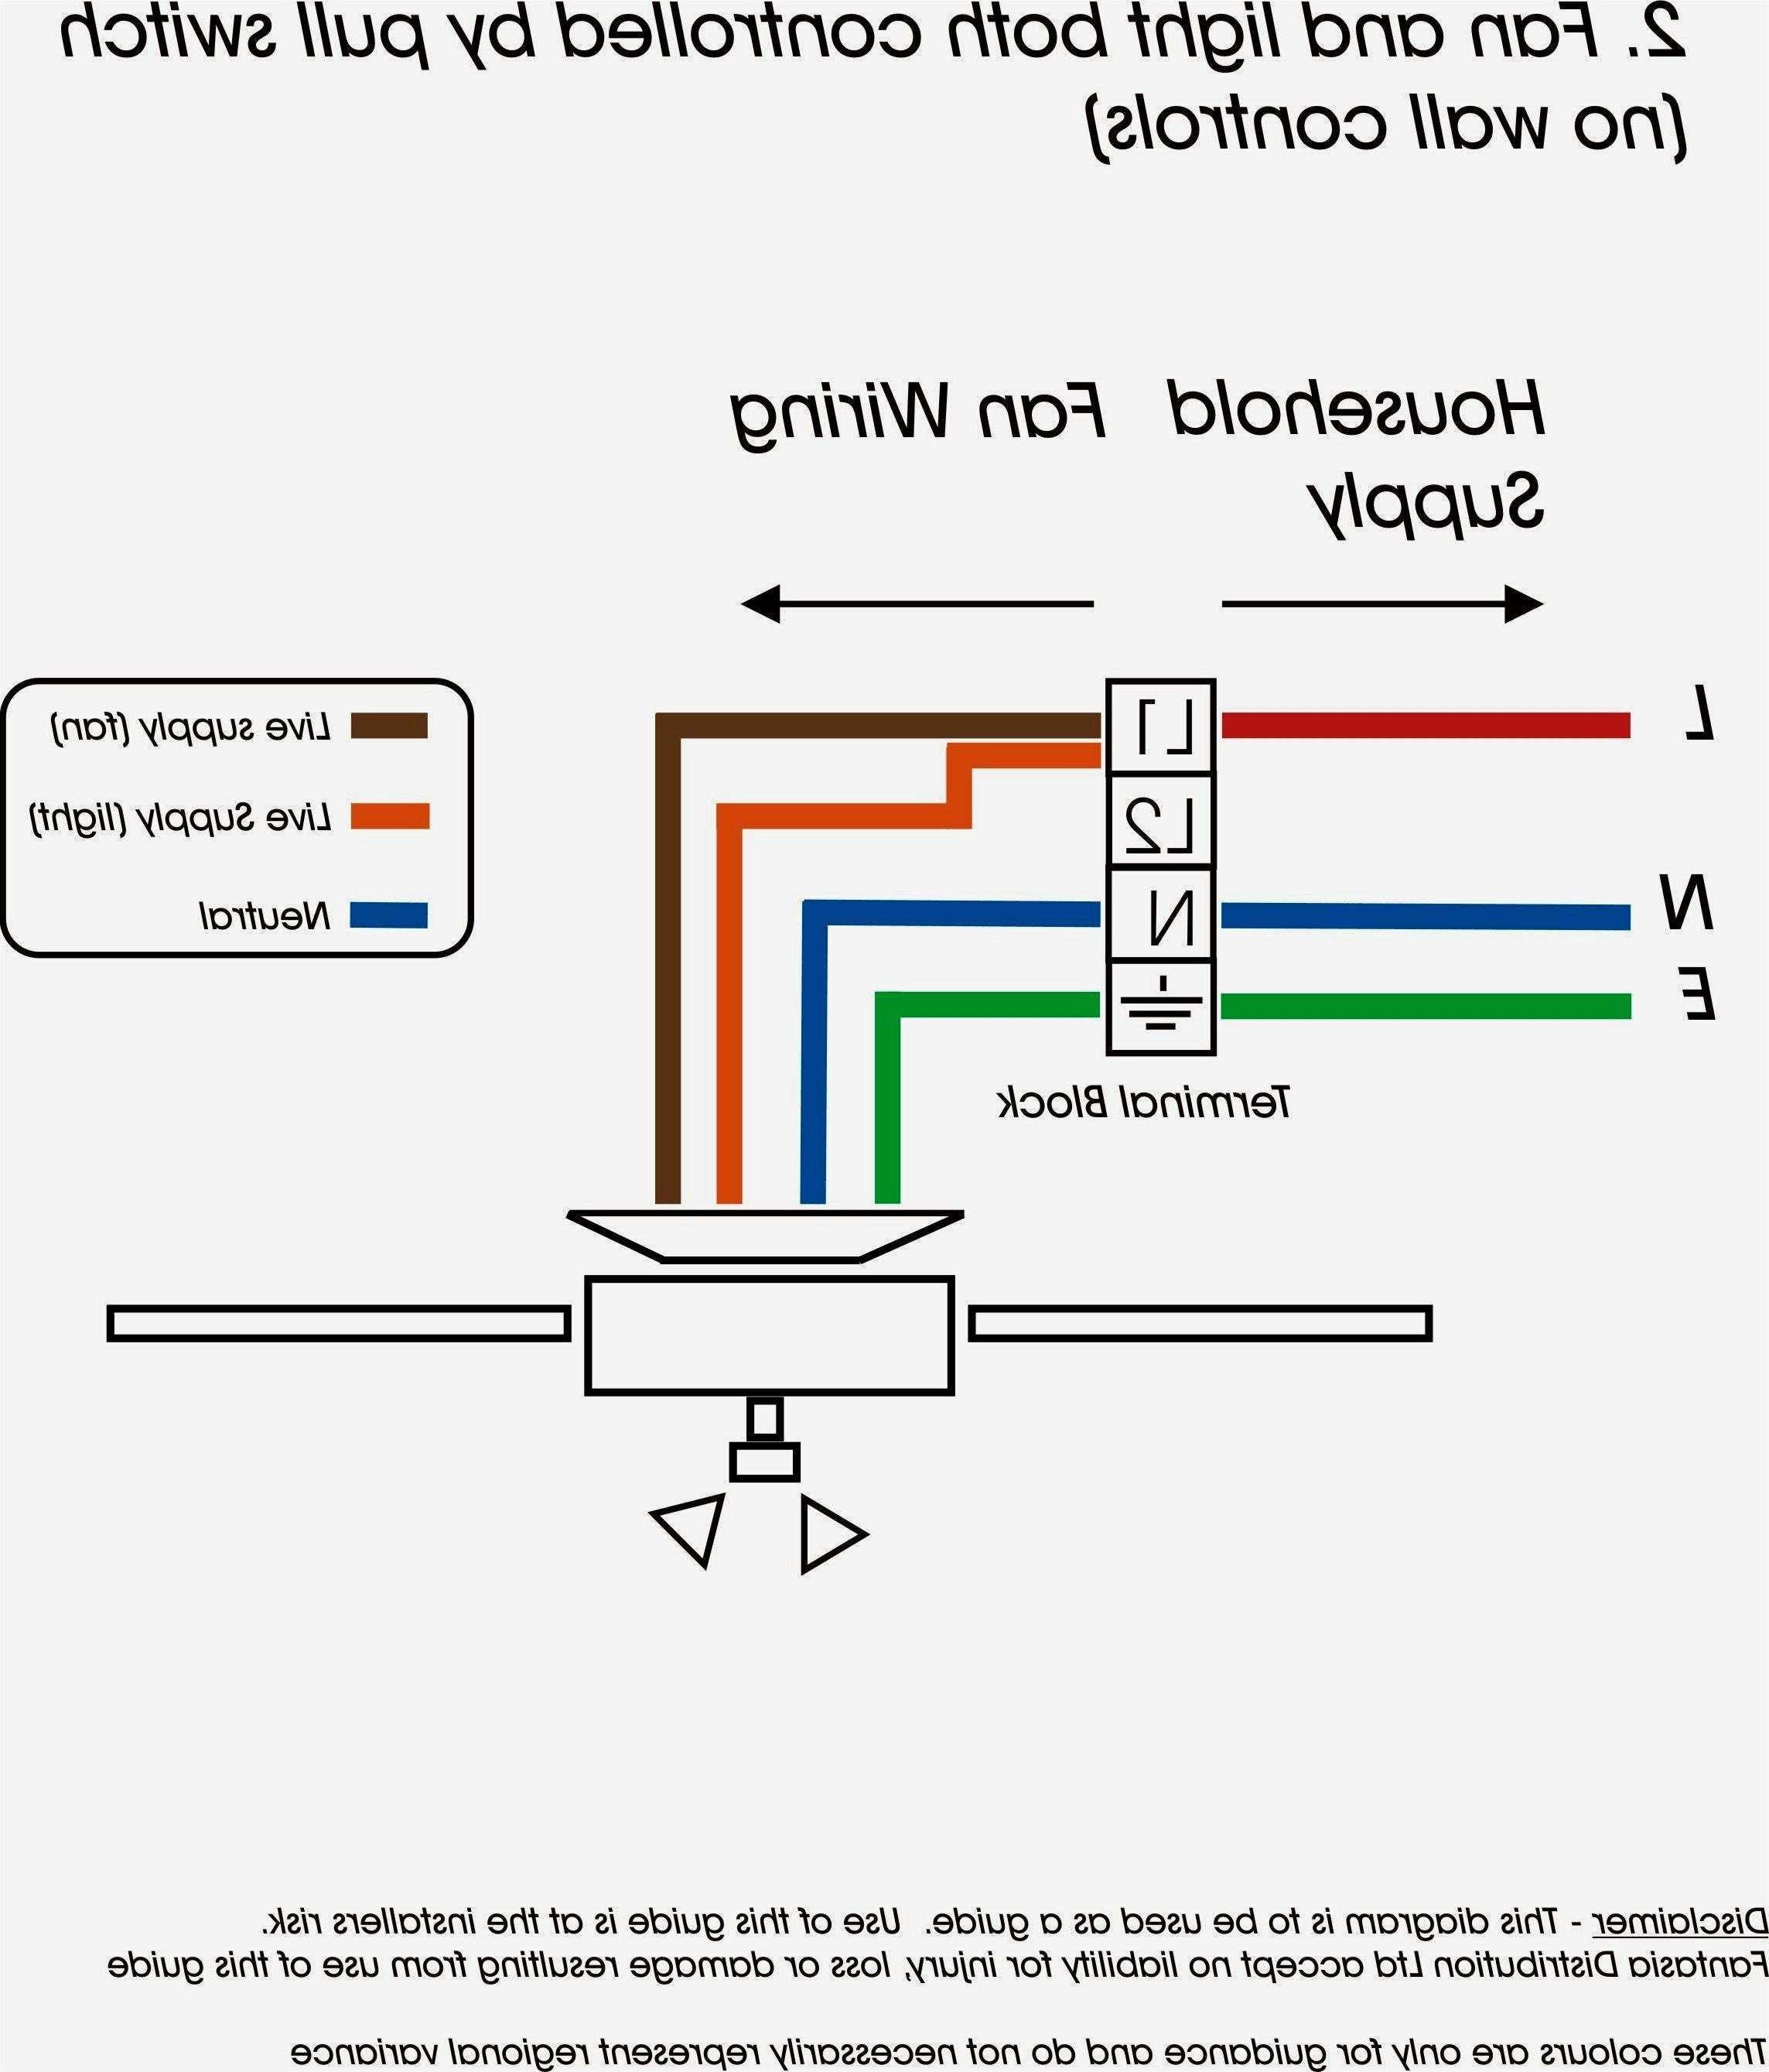 Wiring Diagram 8 Pin Ice Cube Relay Save Electrical Relay Diagram Electrical Relay Wiring Diagram Wiring